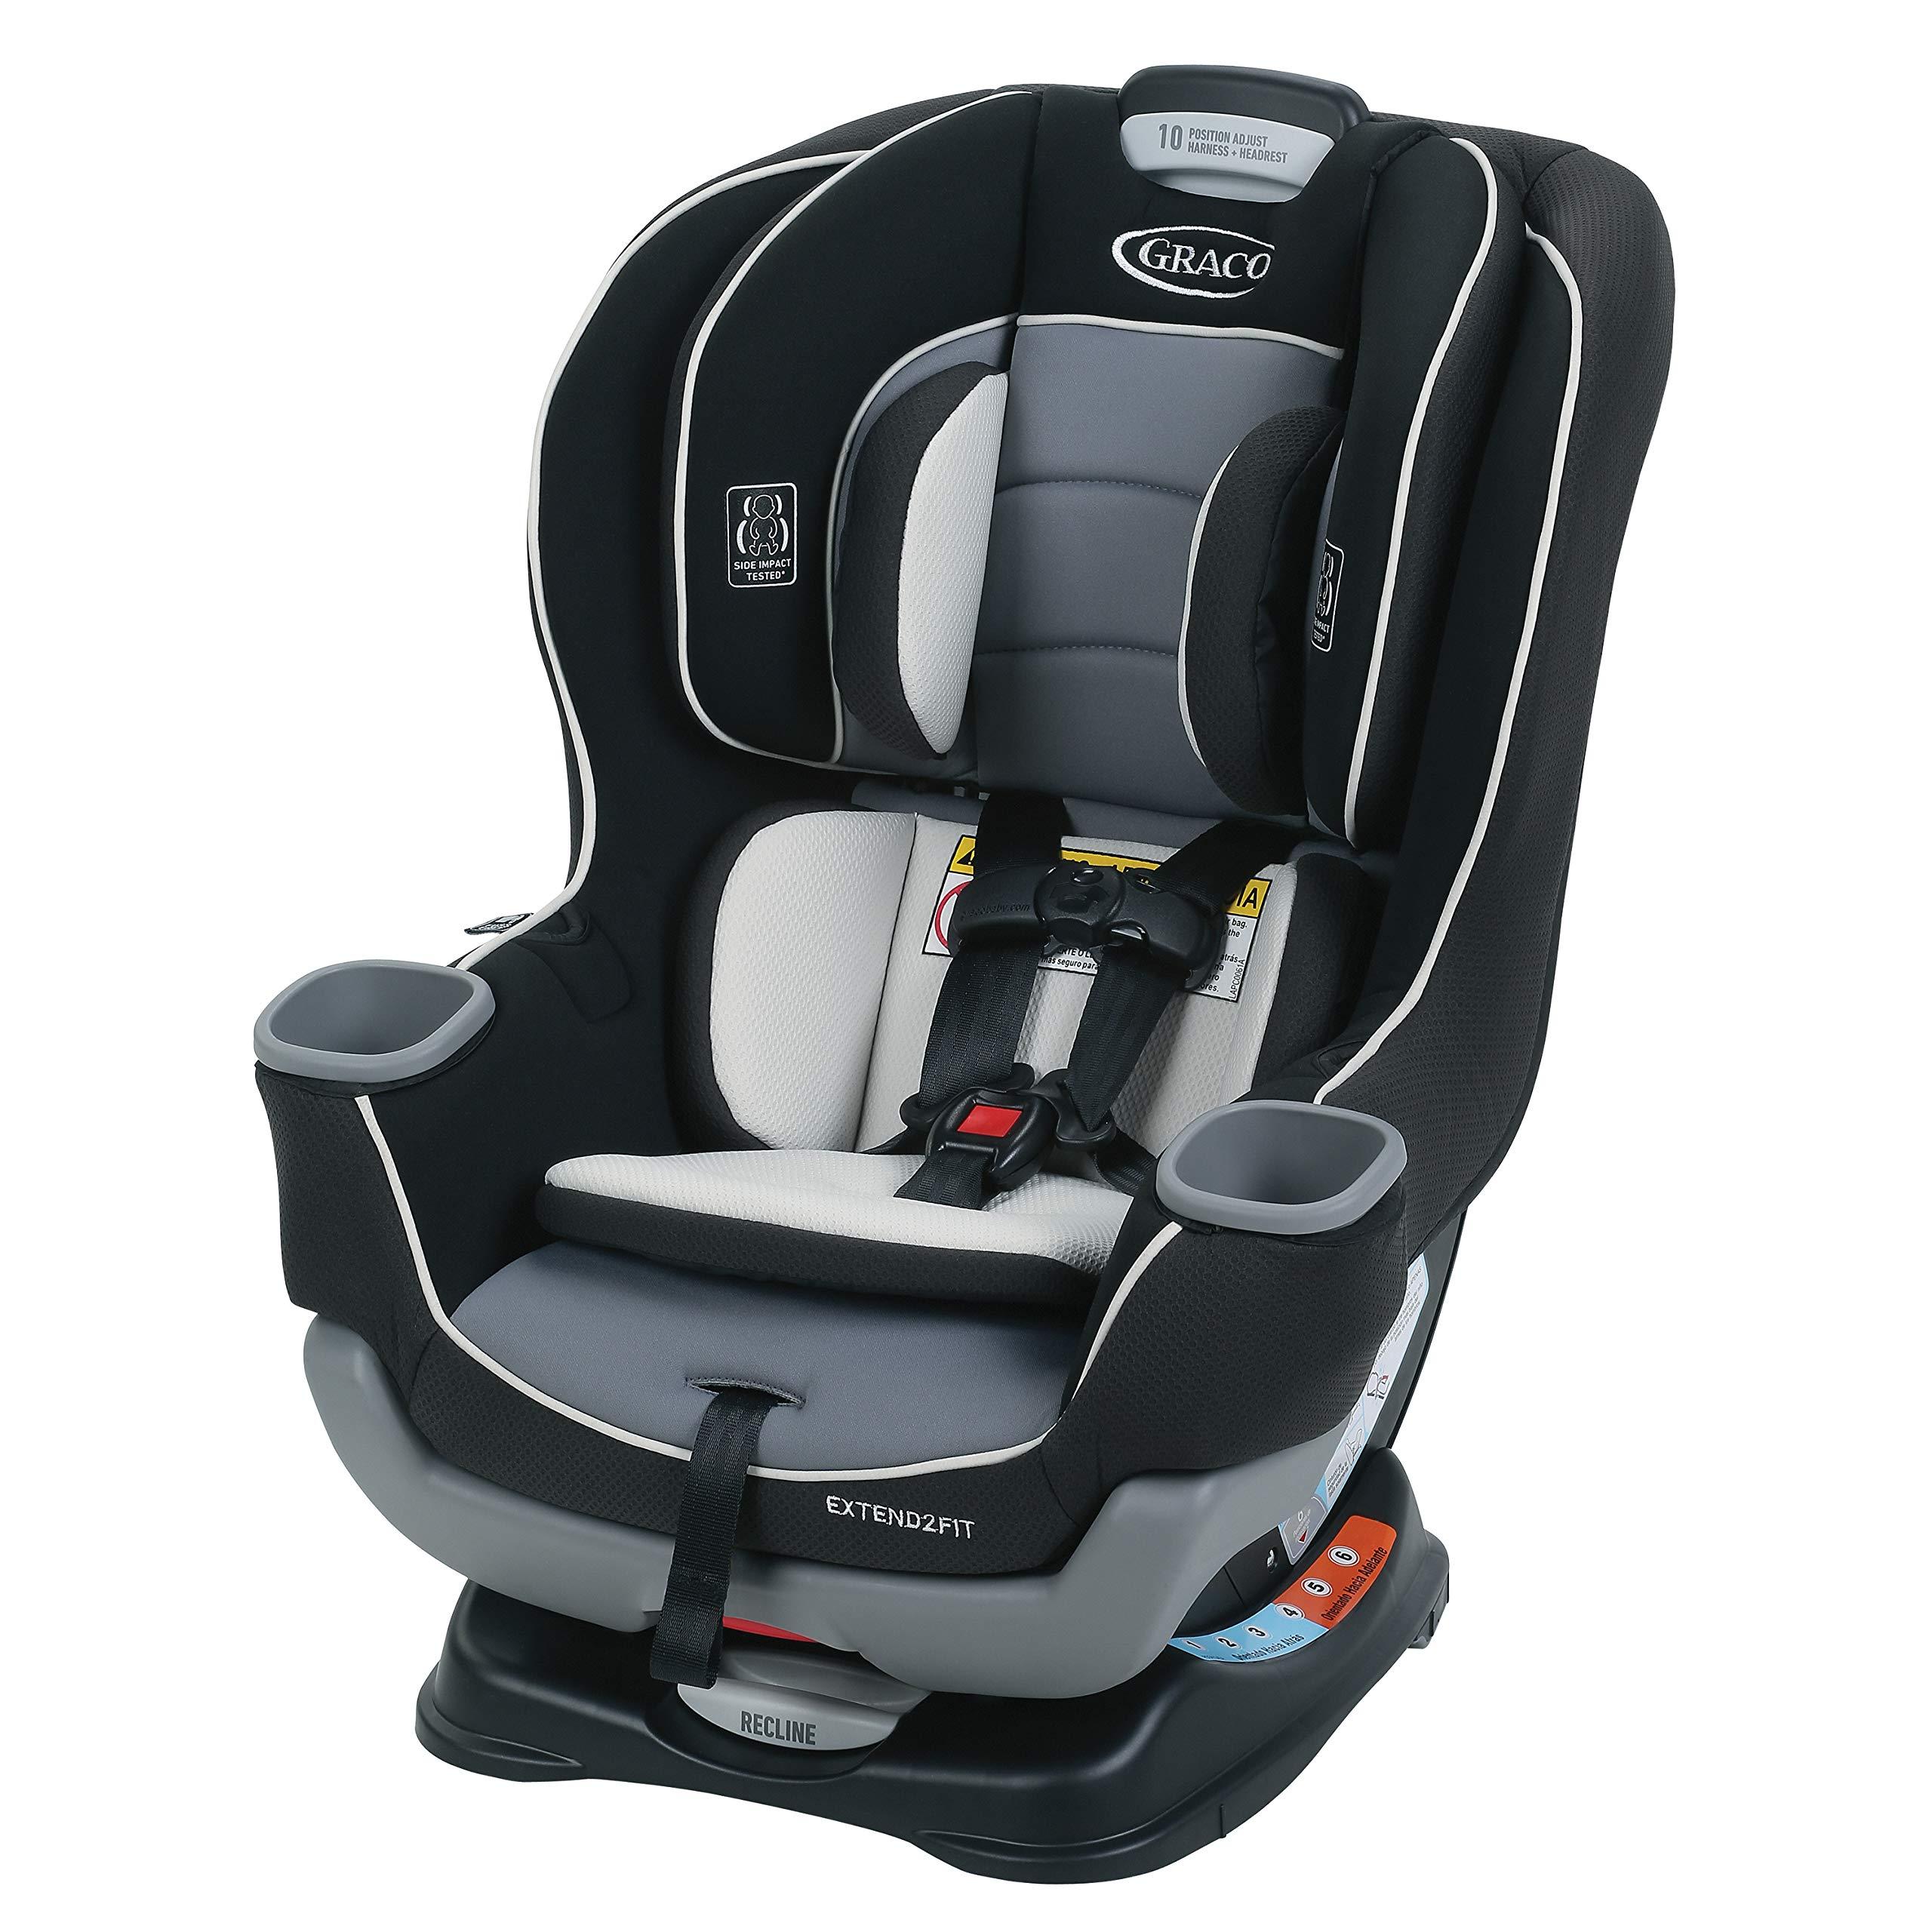 cfa891c08ad Amazon.com   Graco Extend2Fit Convertible Car Seat